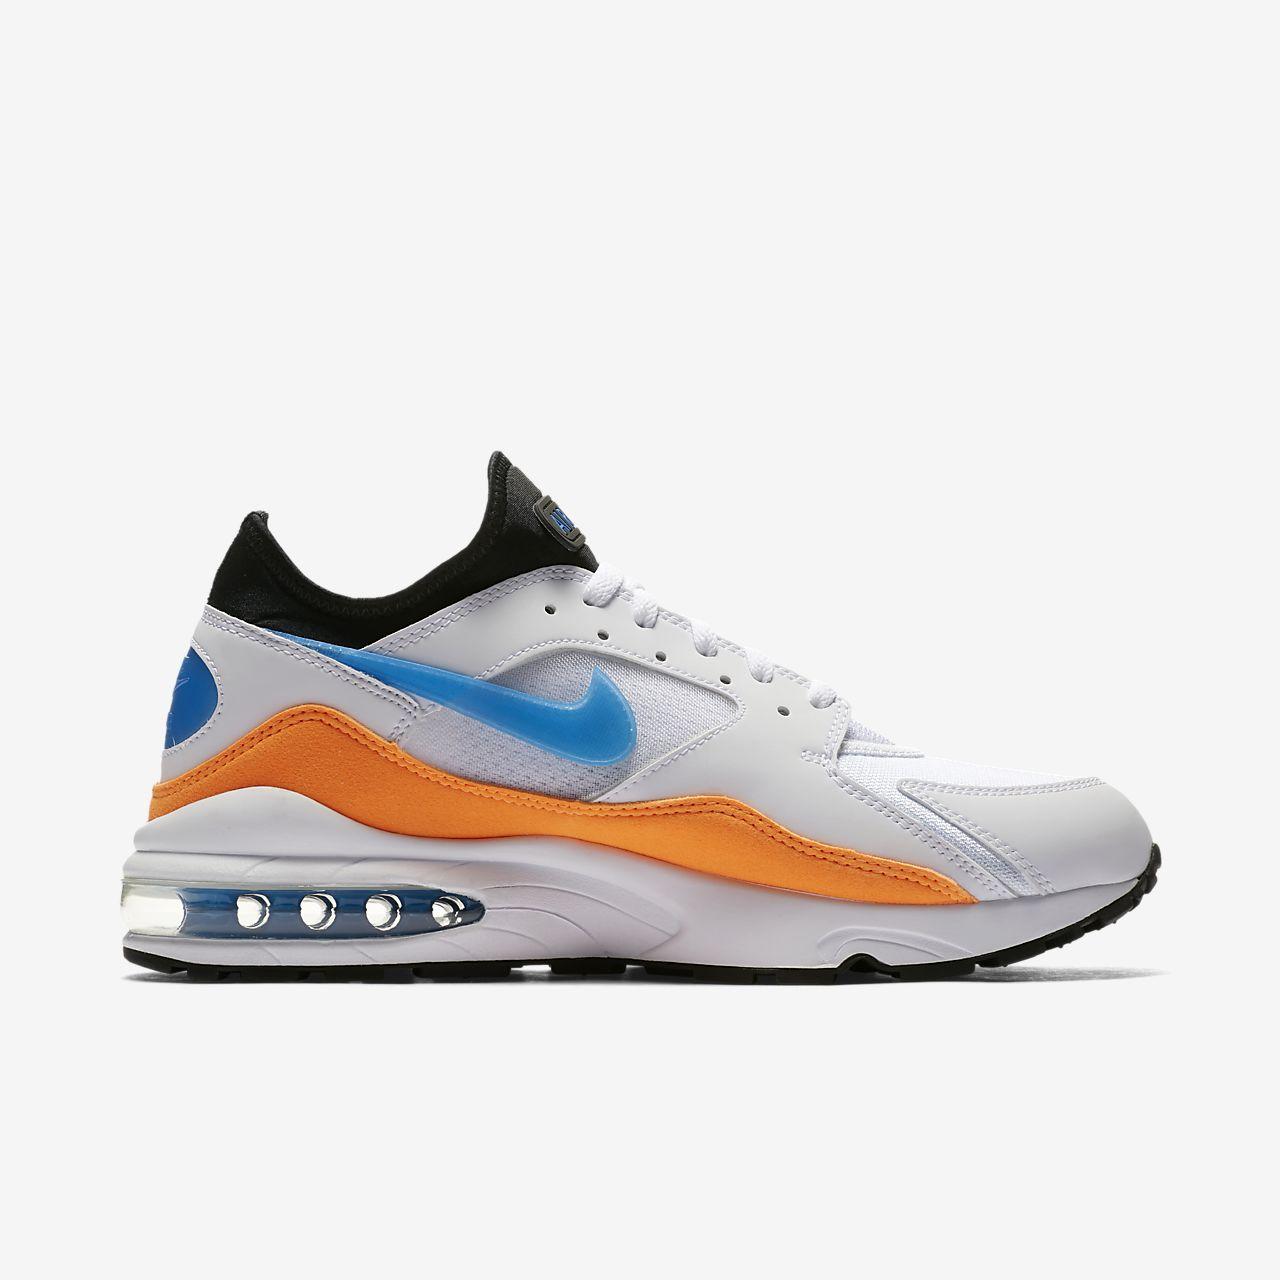 0bce427edf6 Nike Air Max 93 Men s Shoe. Nike.com GB